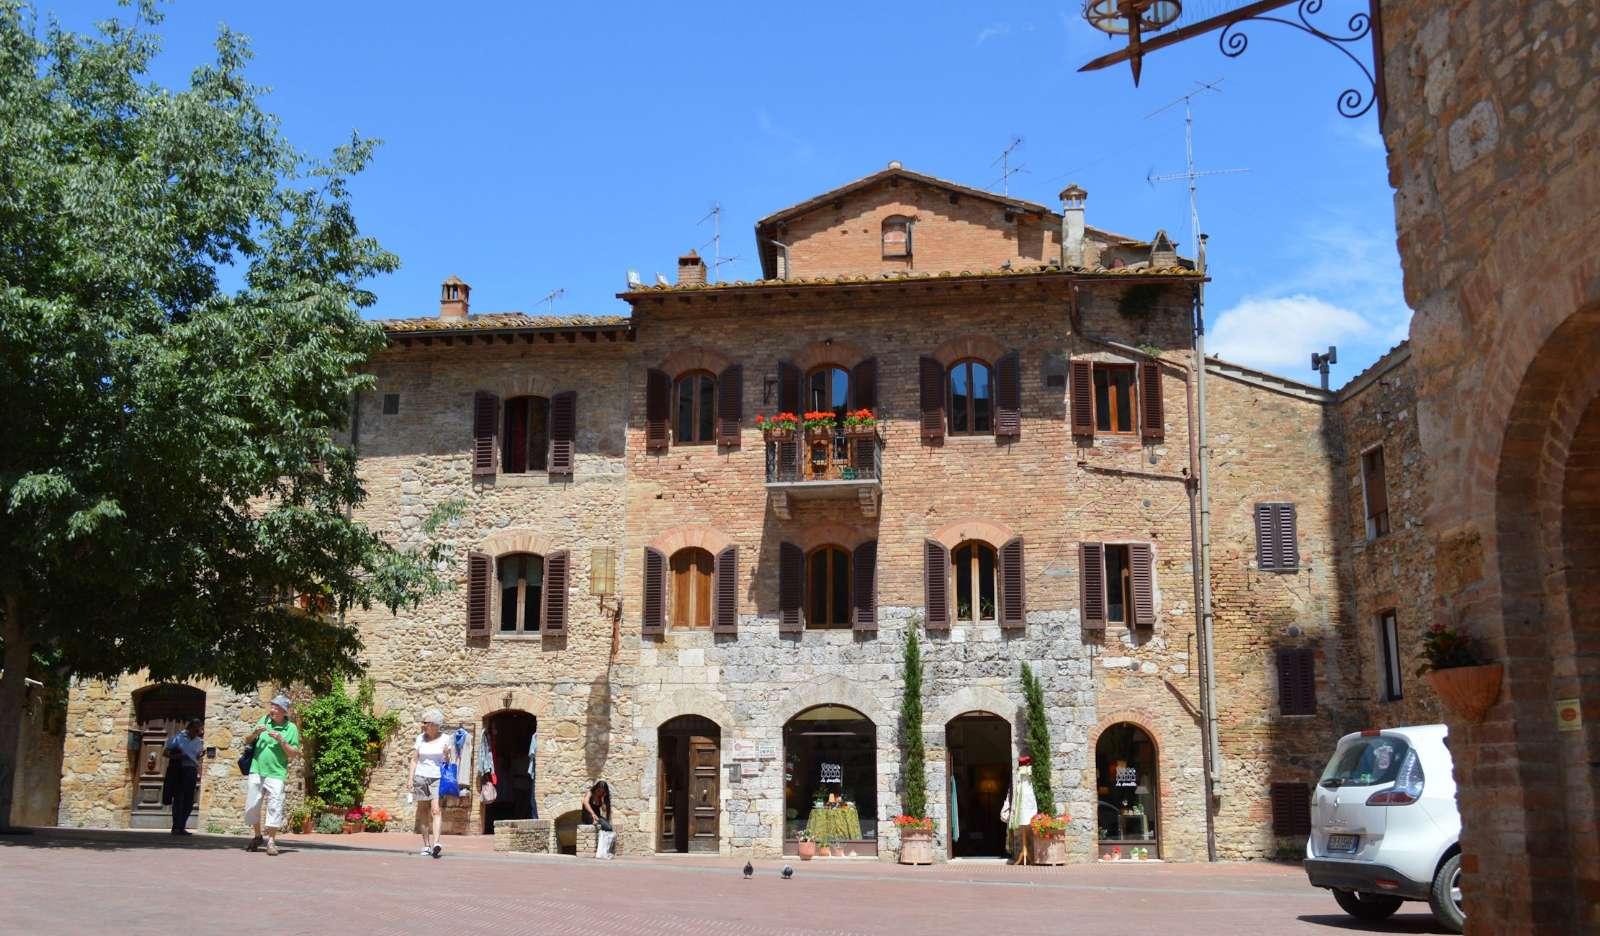 Gadelivet i San Gimignano